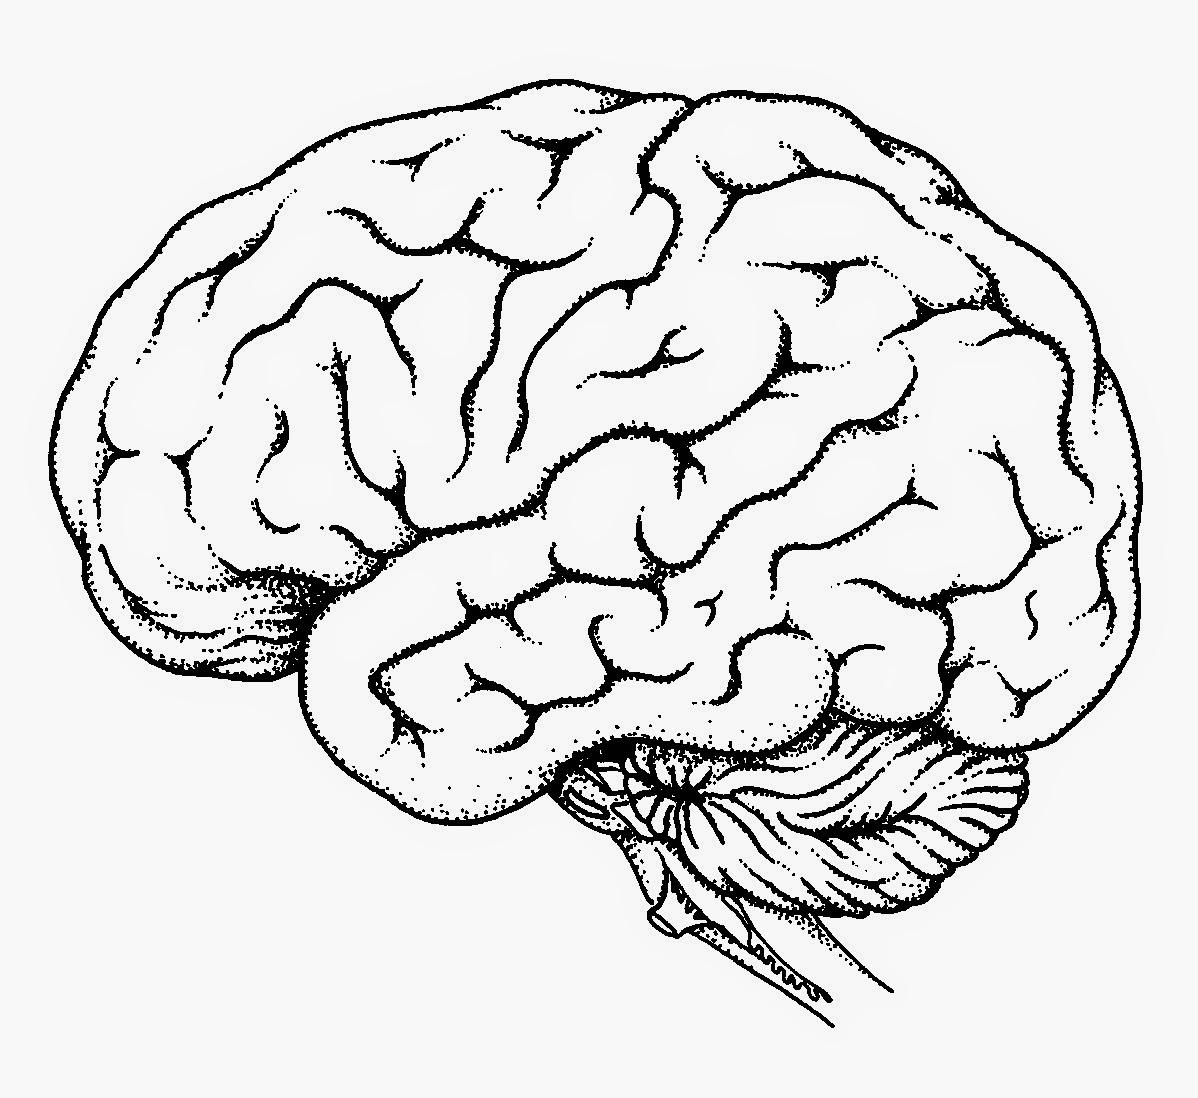 1198x1098 Pencil Art Brain Pics With Lebelled Parts Drawn Brain Unlabelled